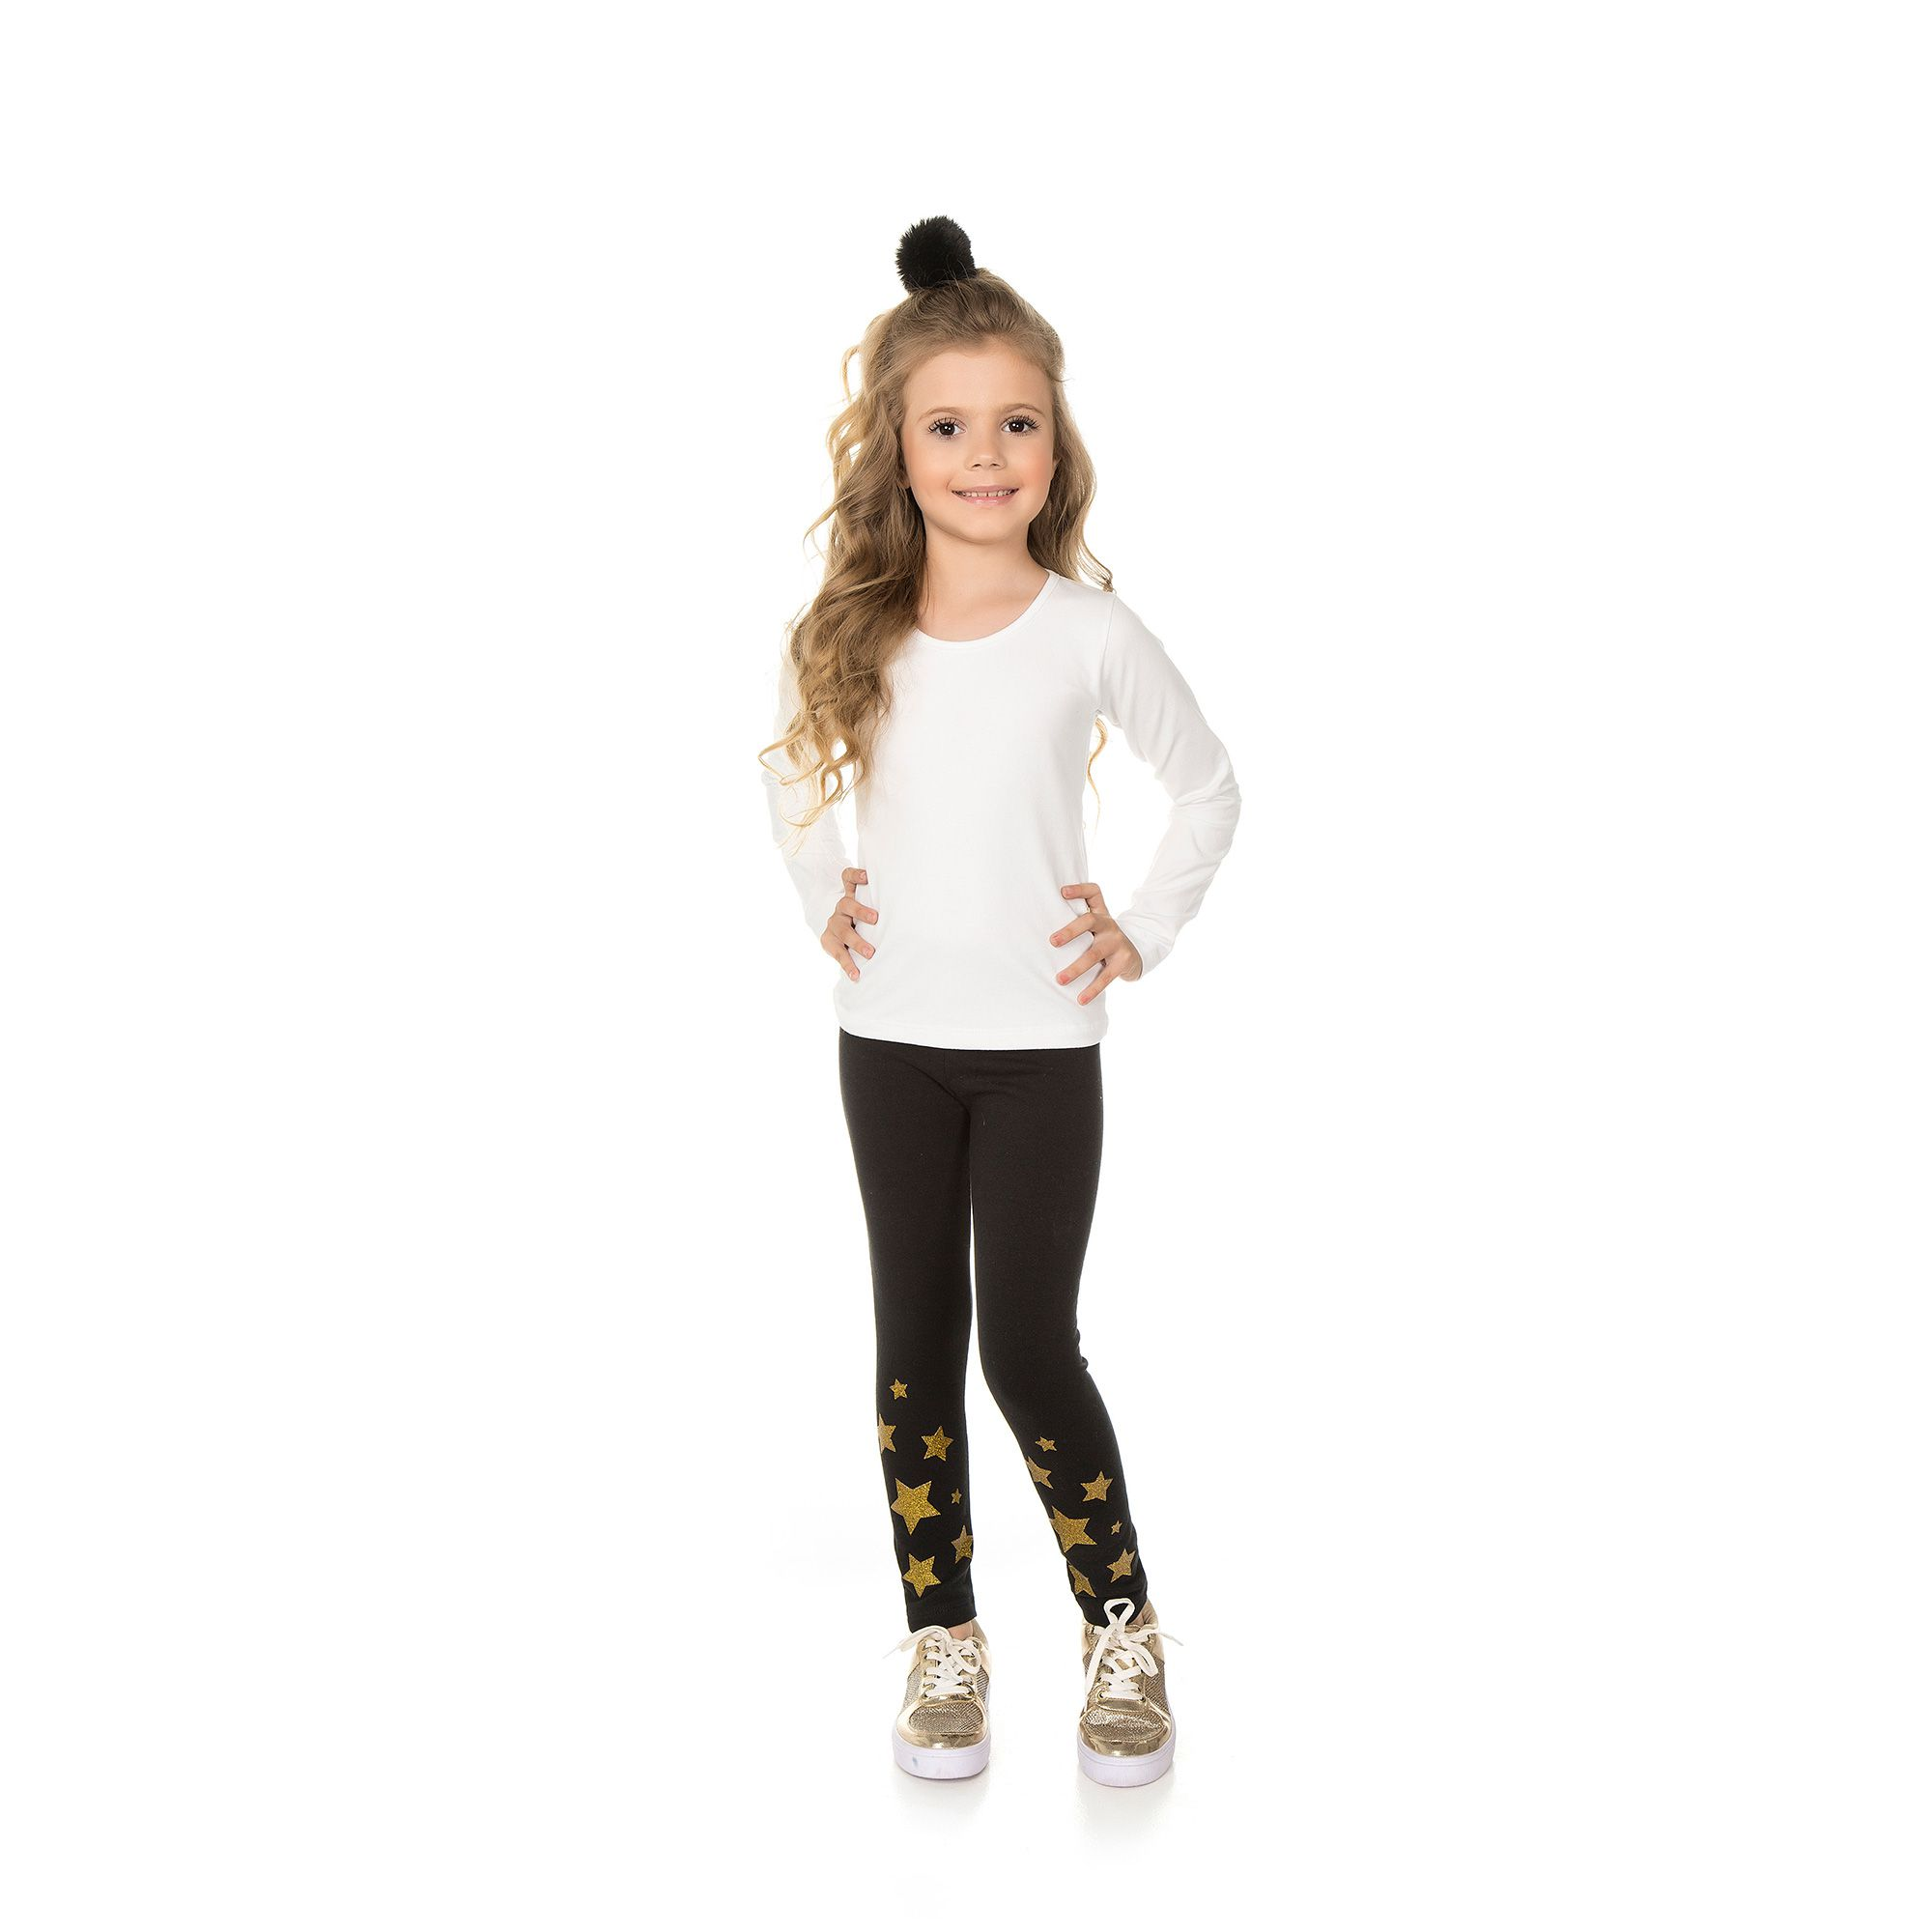 Legging Infantil Feminina - Ref 5009 - Preto